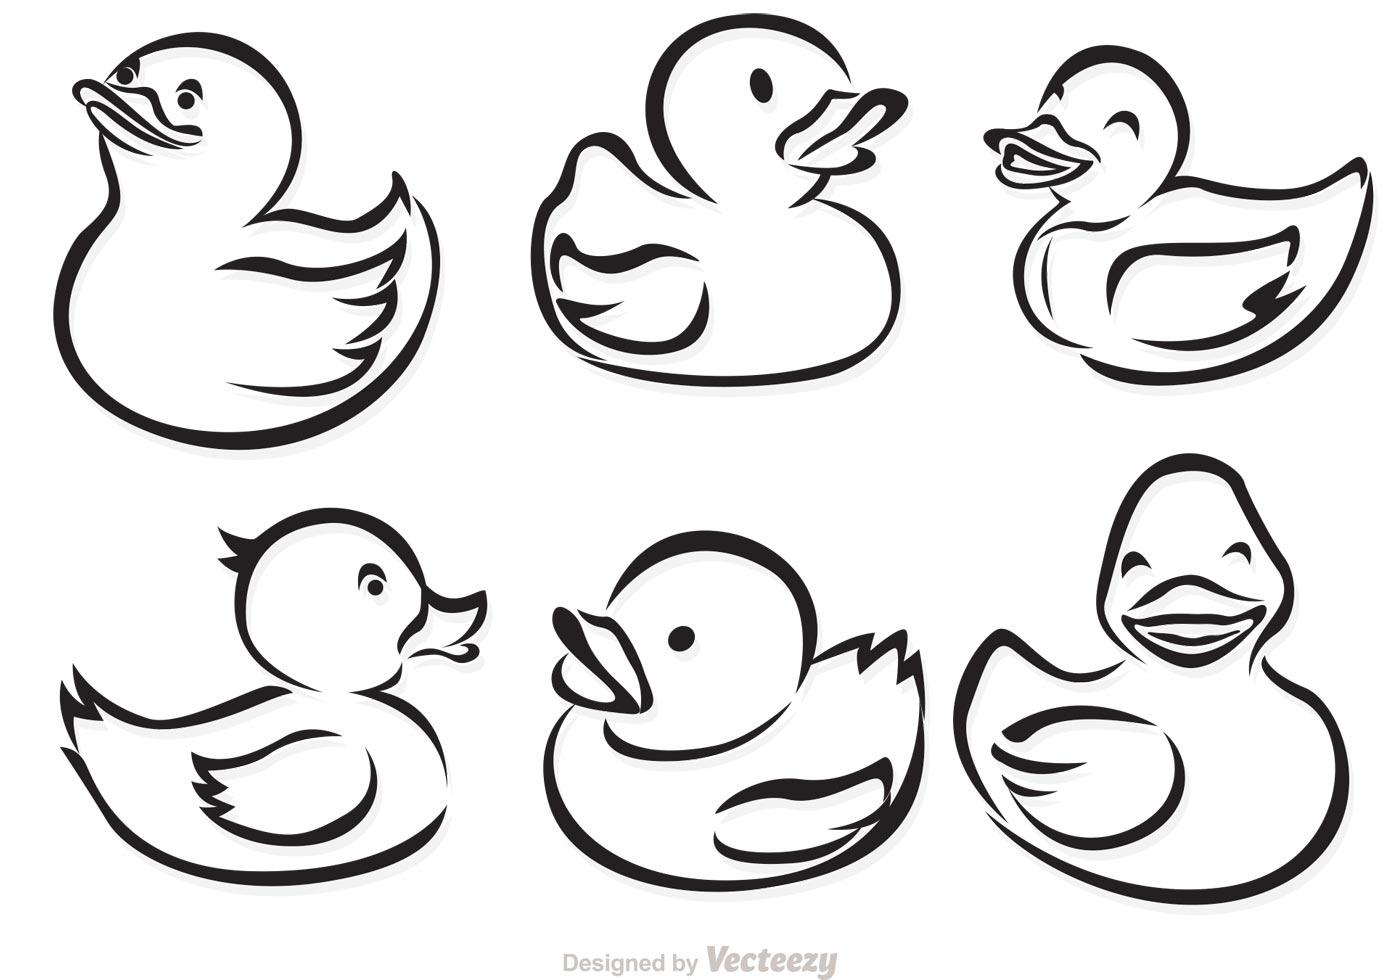 Rubber Duck Outline Vectors